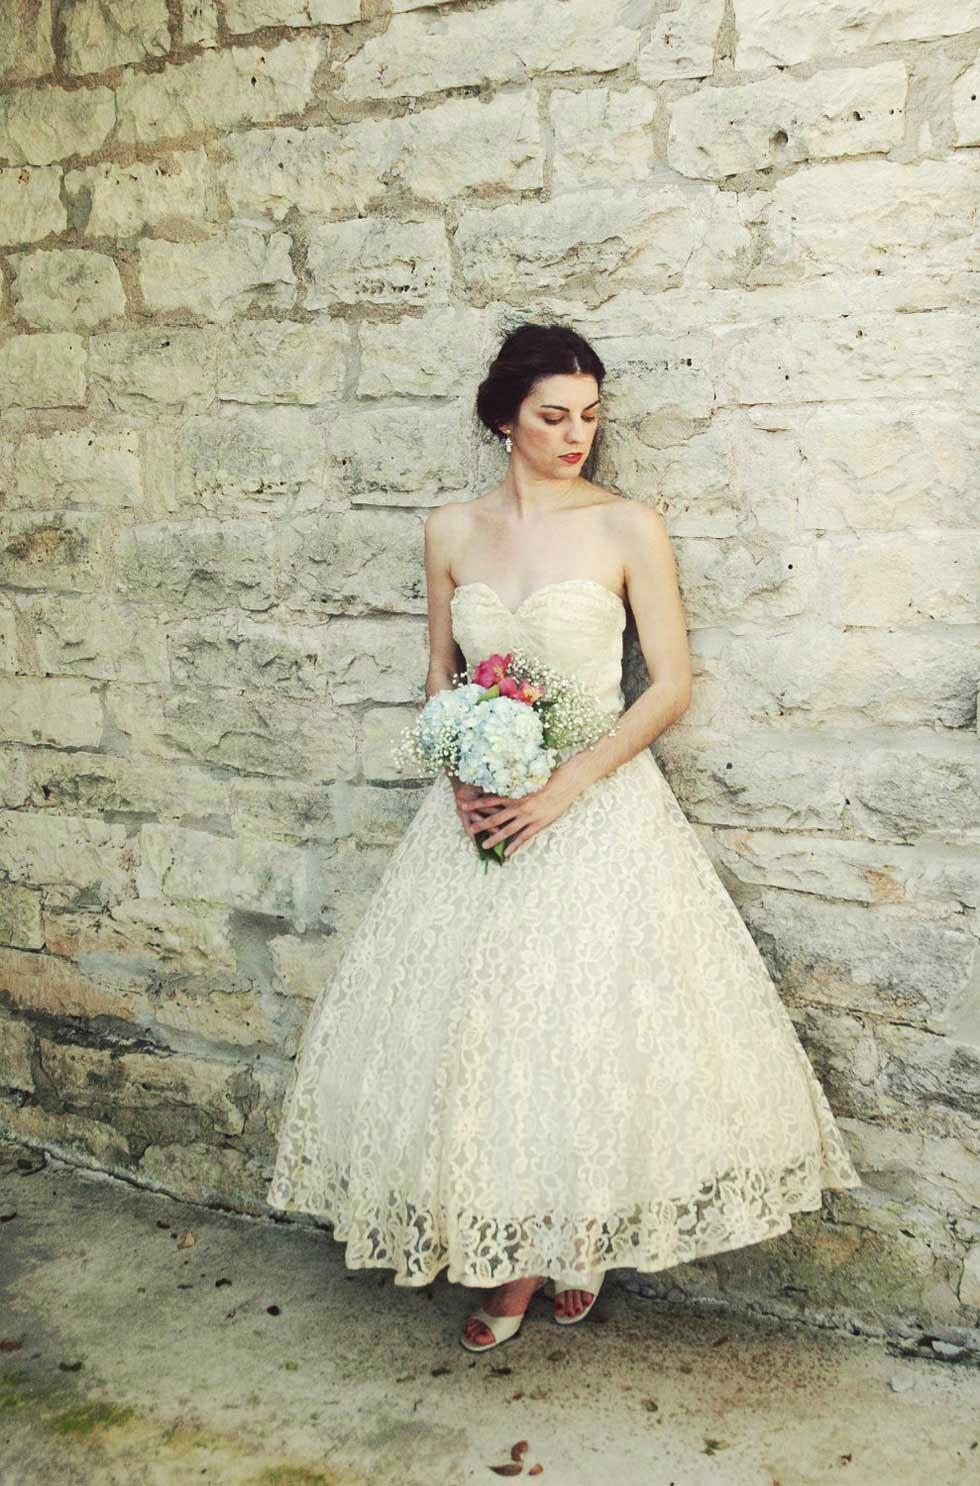 Vintage Wedding Dresses Tumblr Photos HD Concepts Ideas